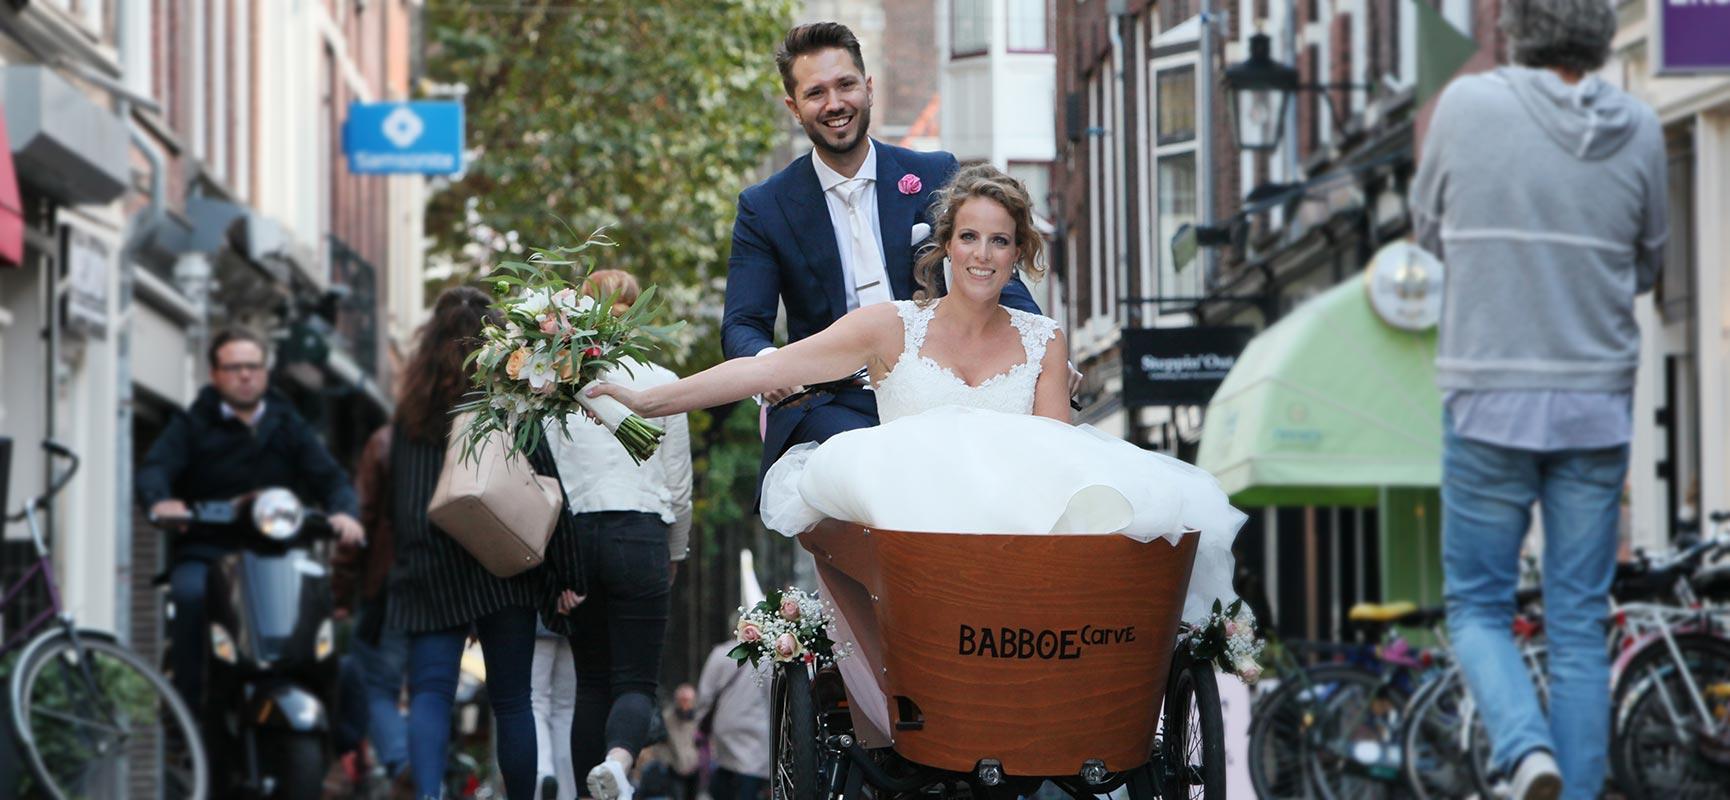 Op de bakfiets trouwen? Dat kan!